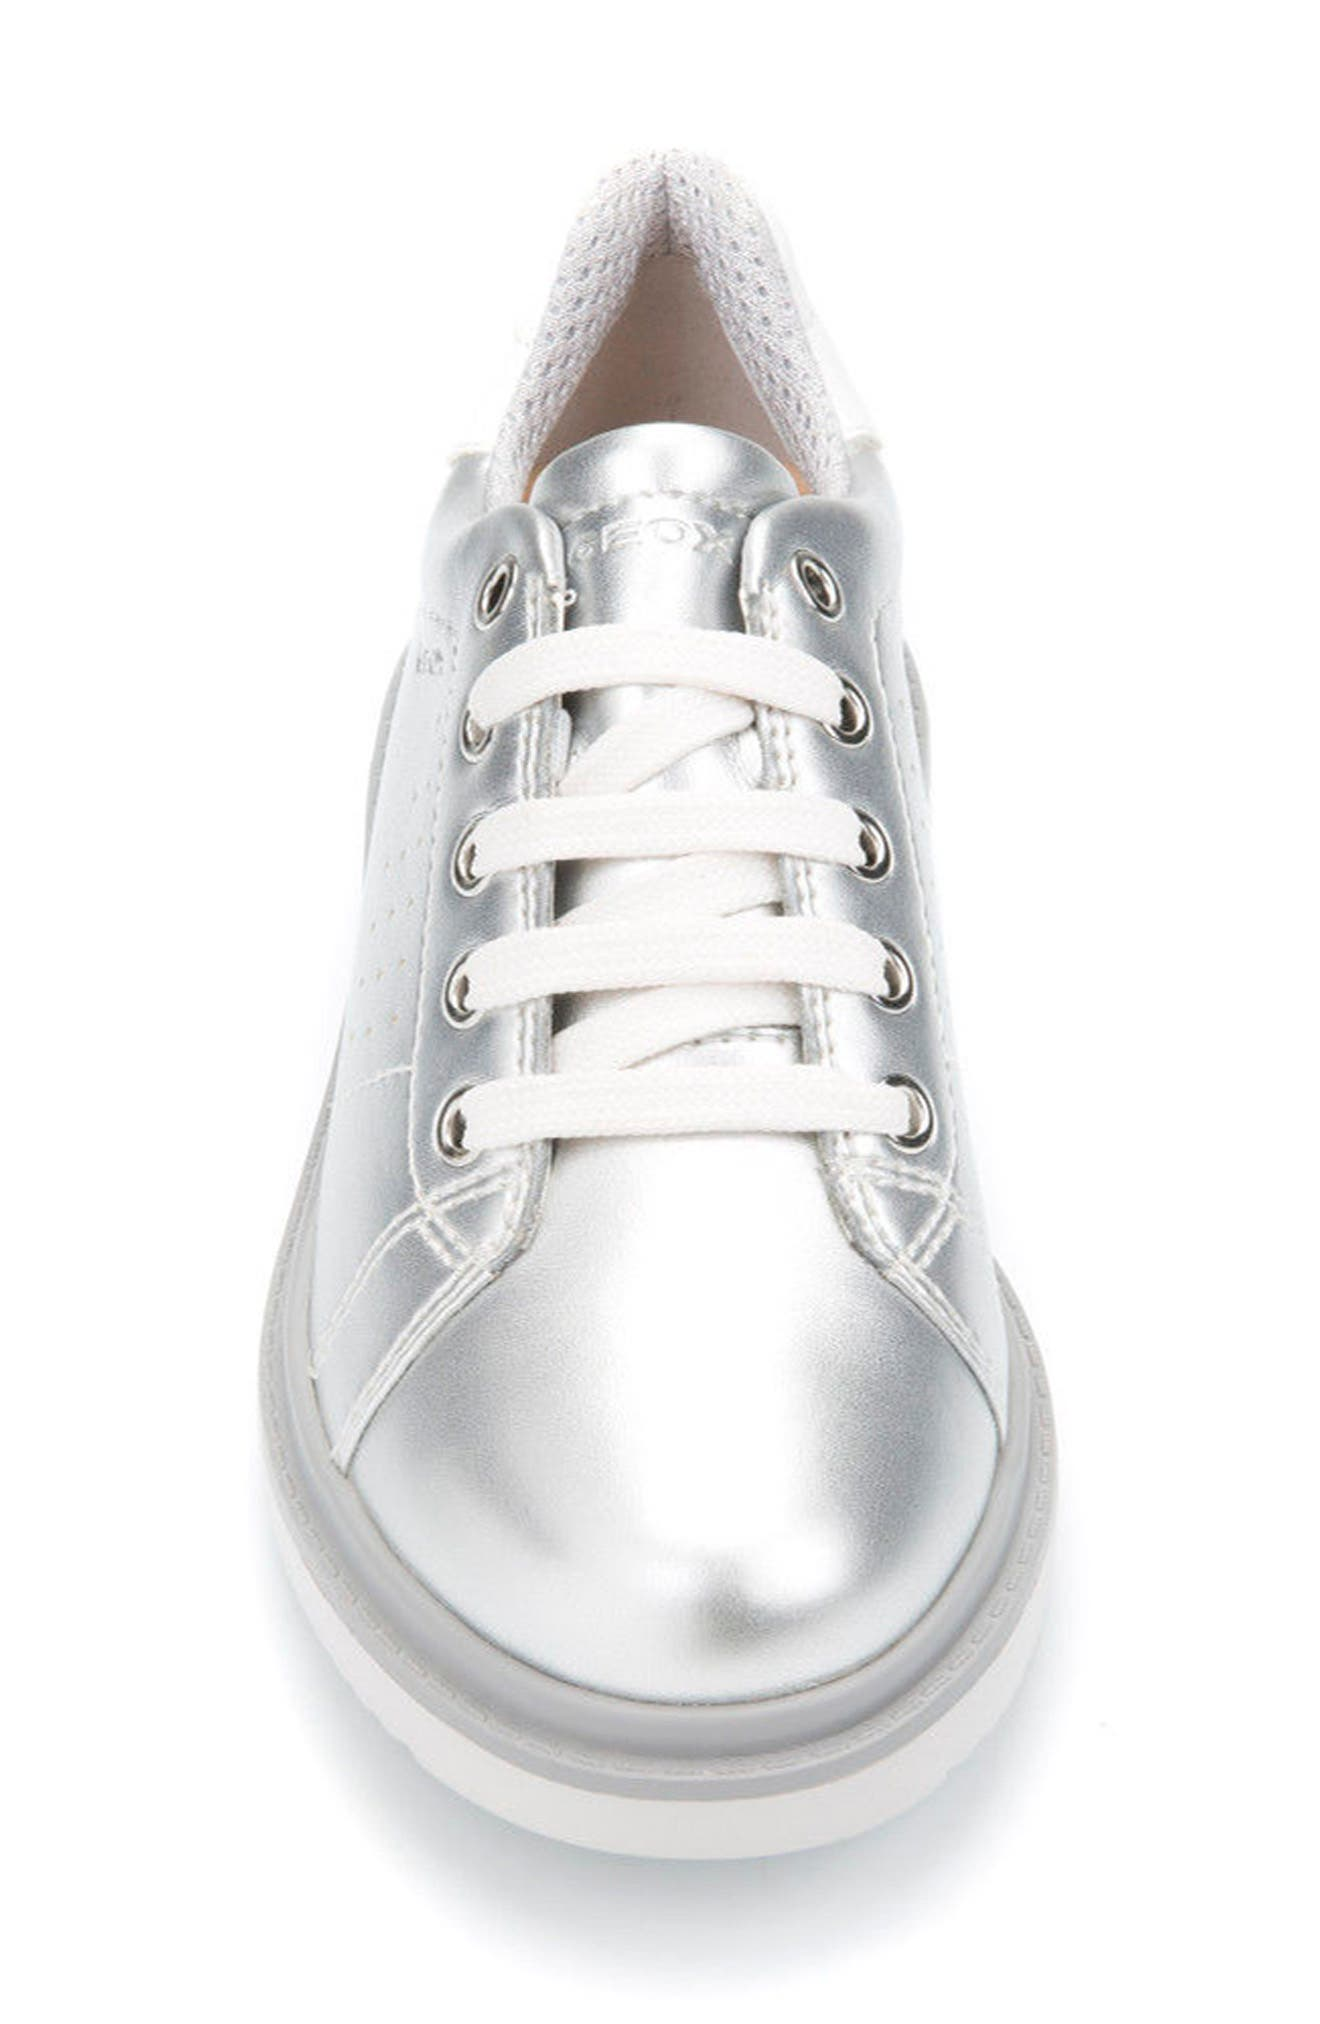 Thymar Low Top Sneaker,                             Alternate thumbnail 4, color,                             SILVER